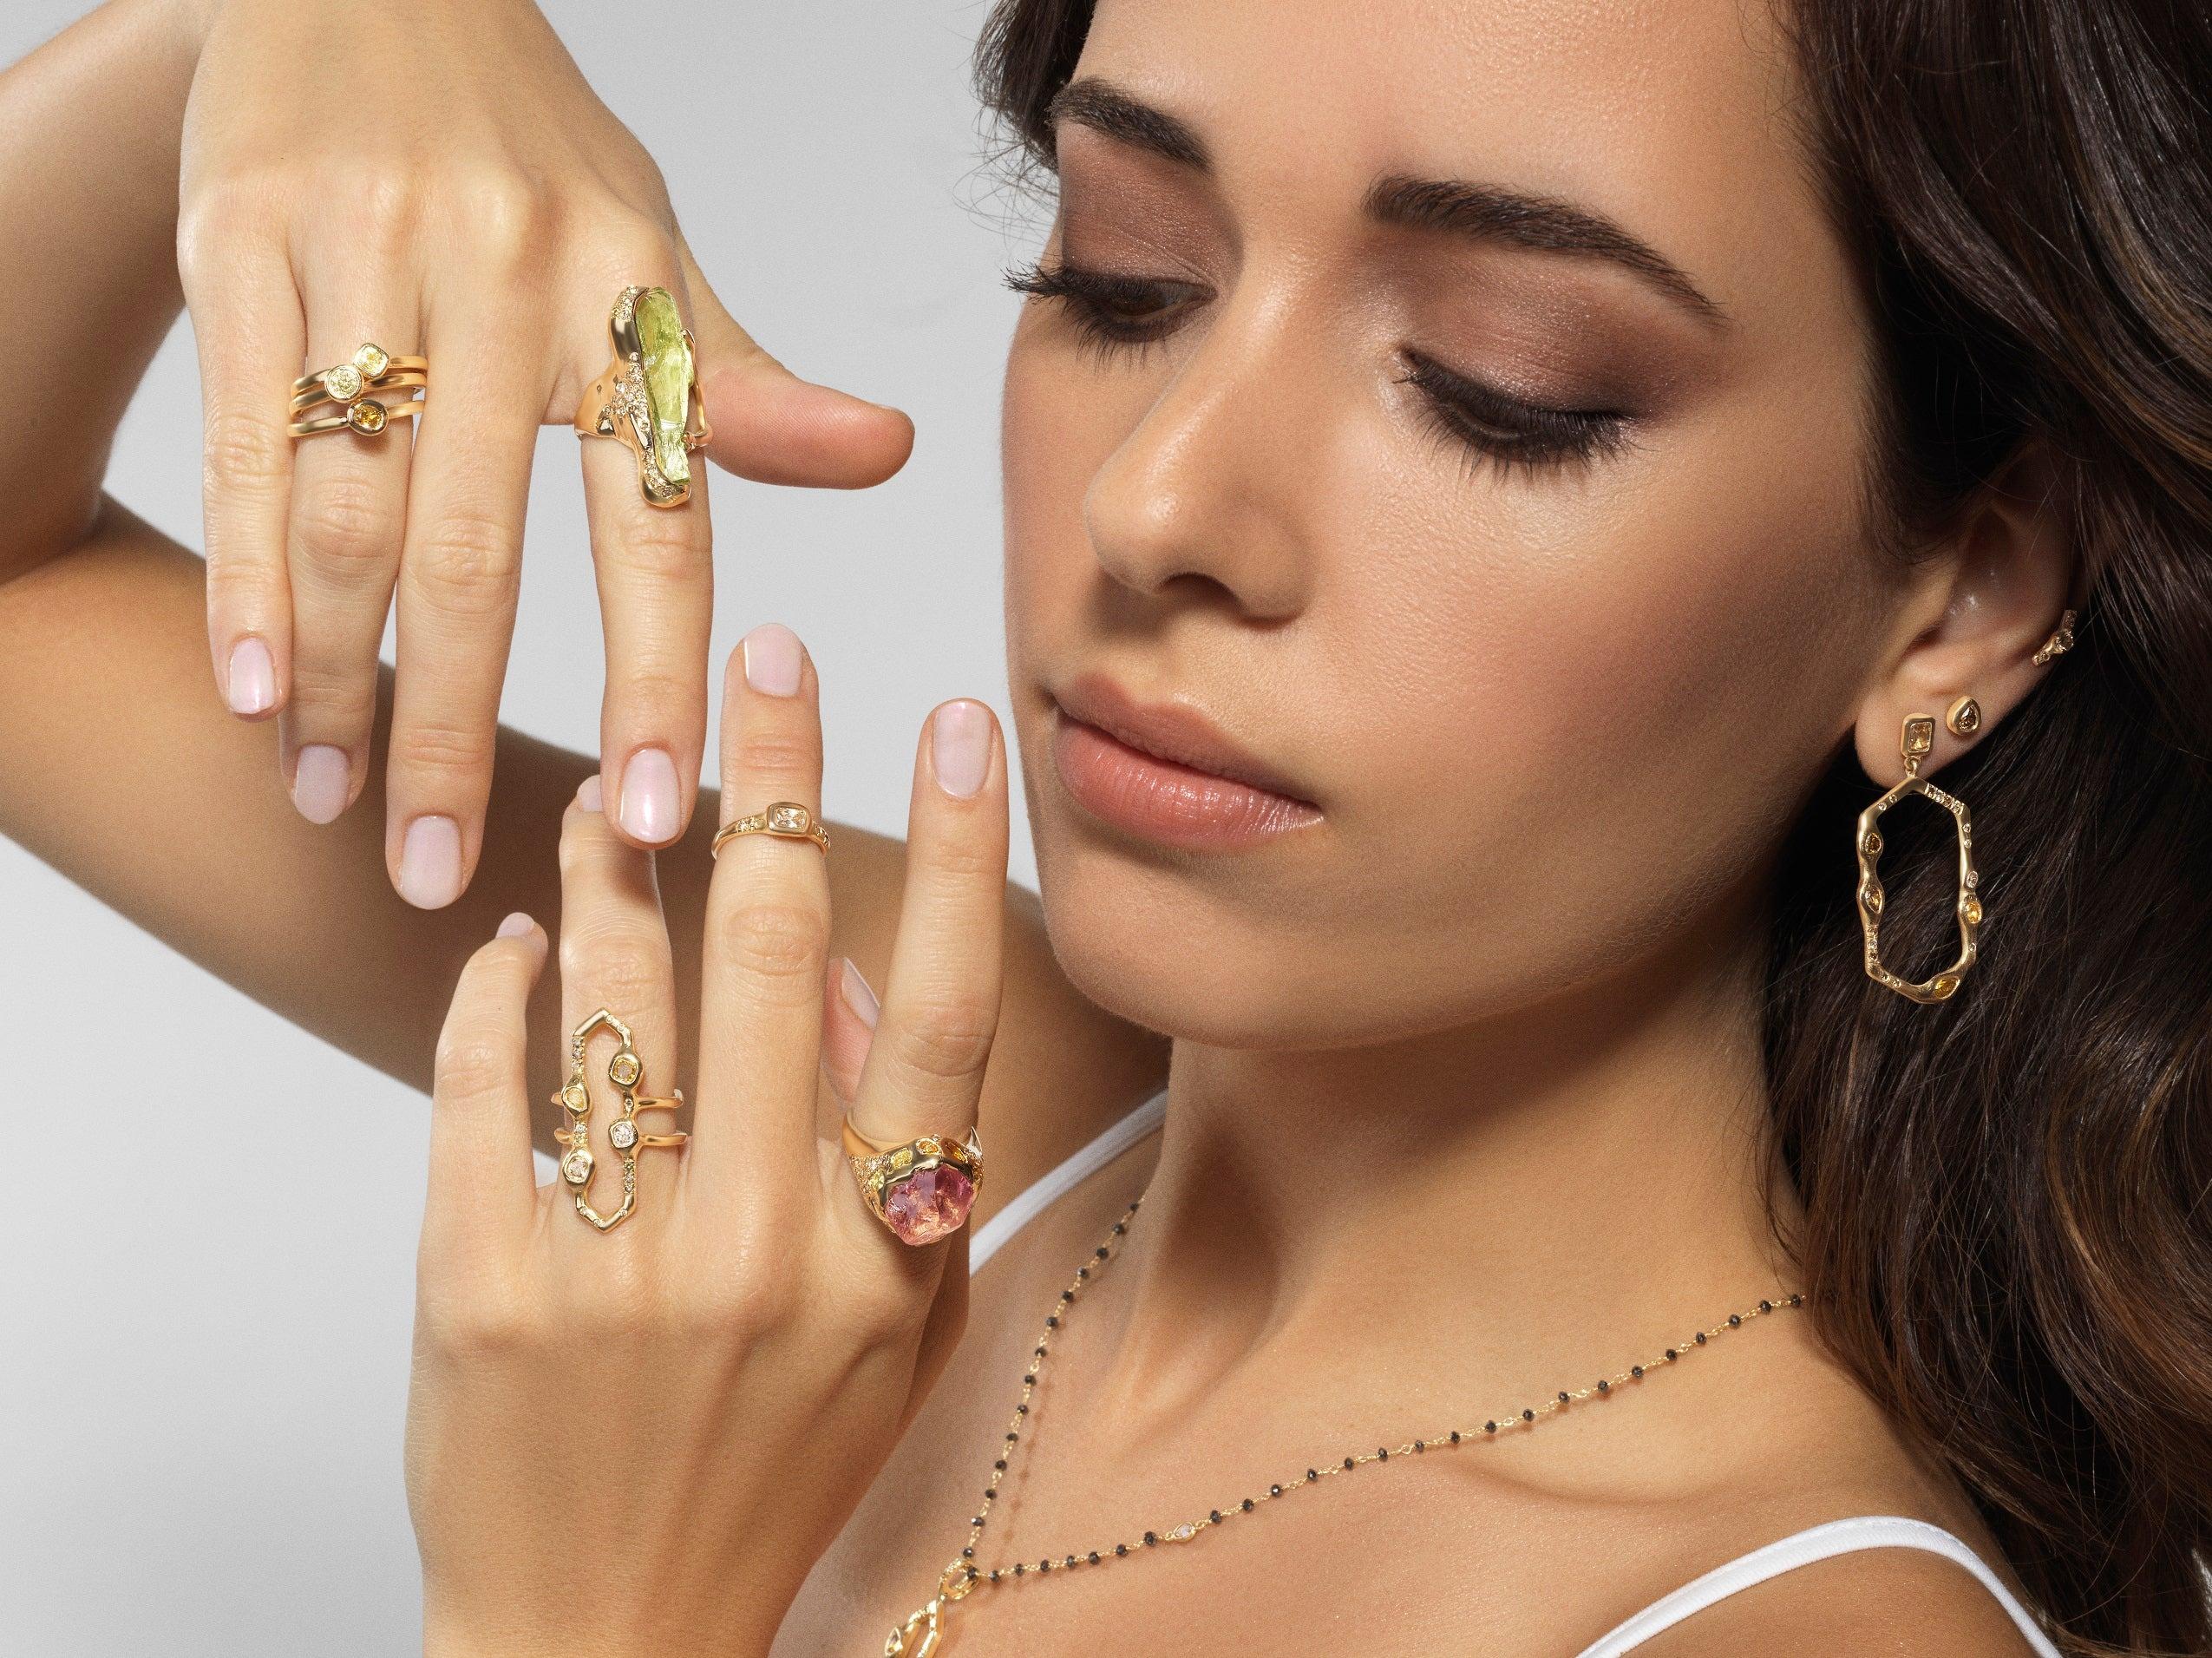 Debra Navarro Garnet And Diamond 18k Gold Band Stack Ring 2 09 Carat Spessartine For Sale At 1stdibs